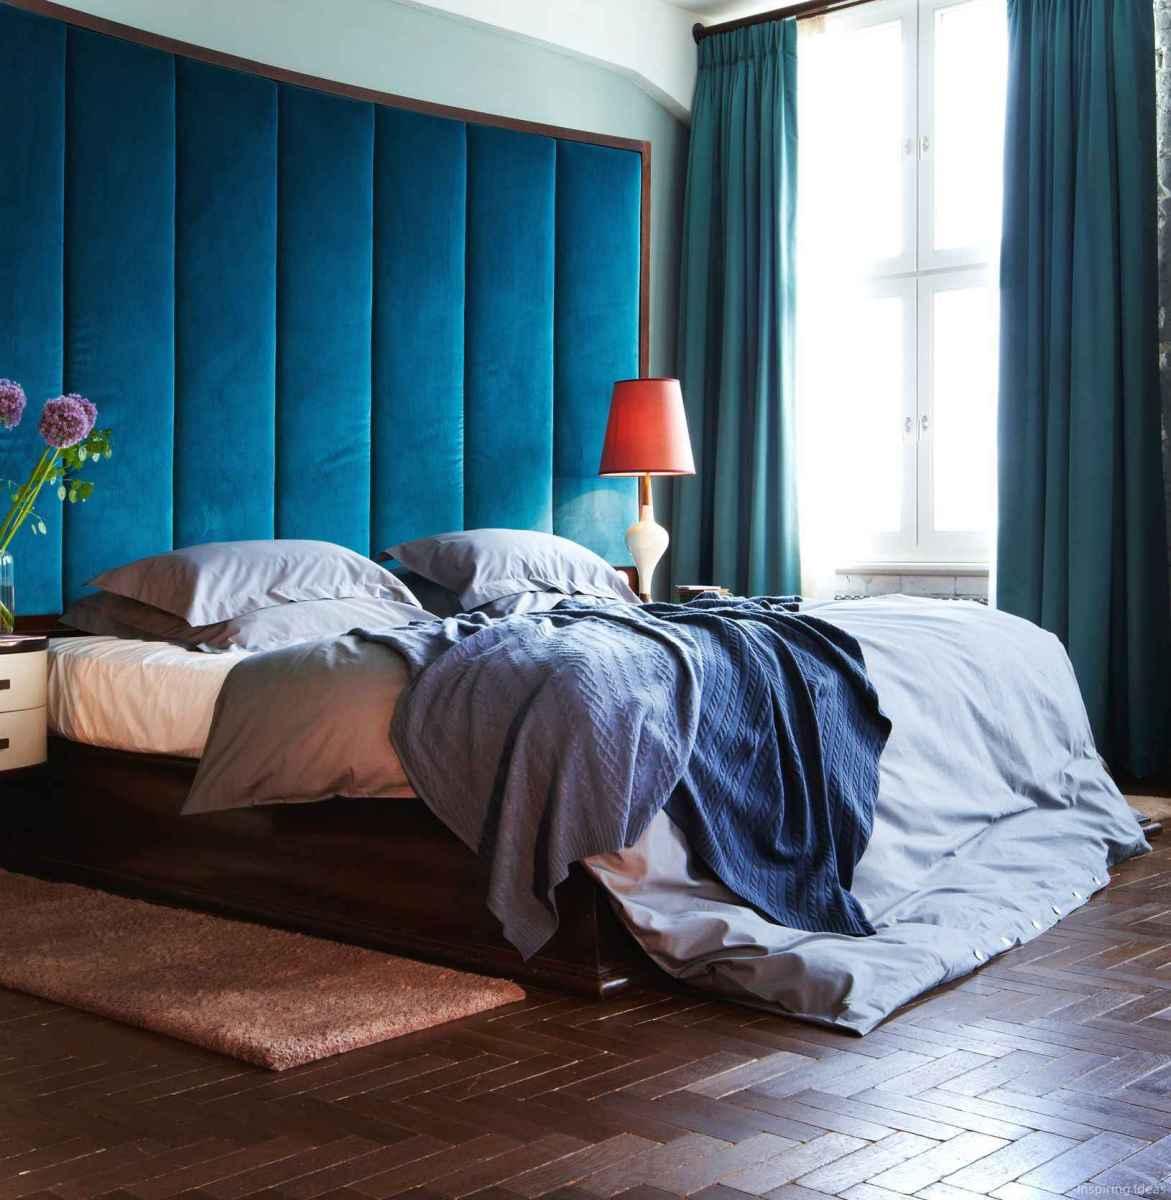 0062 luxurious bed linens color schemes ideas